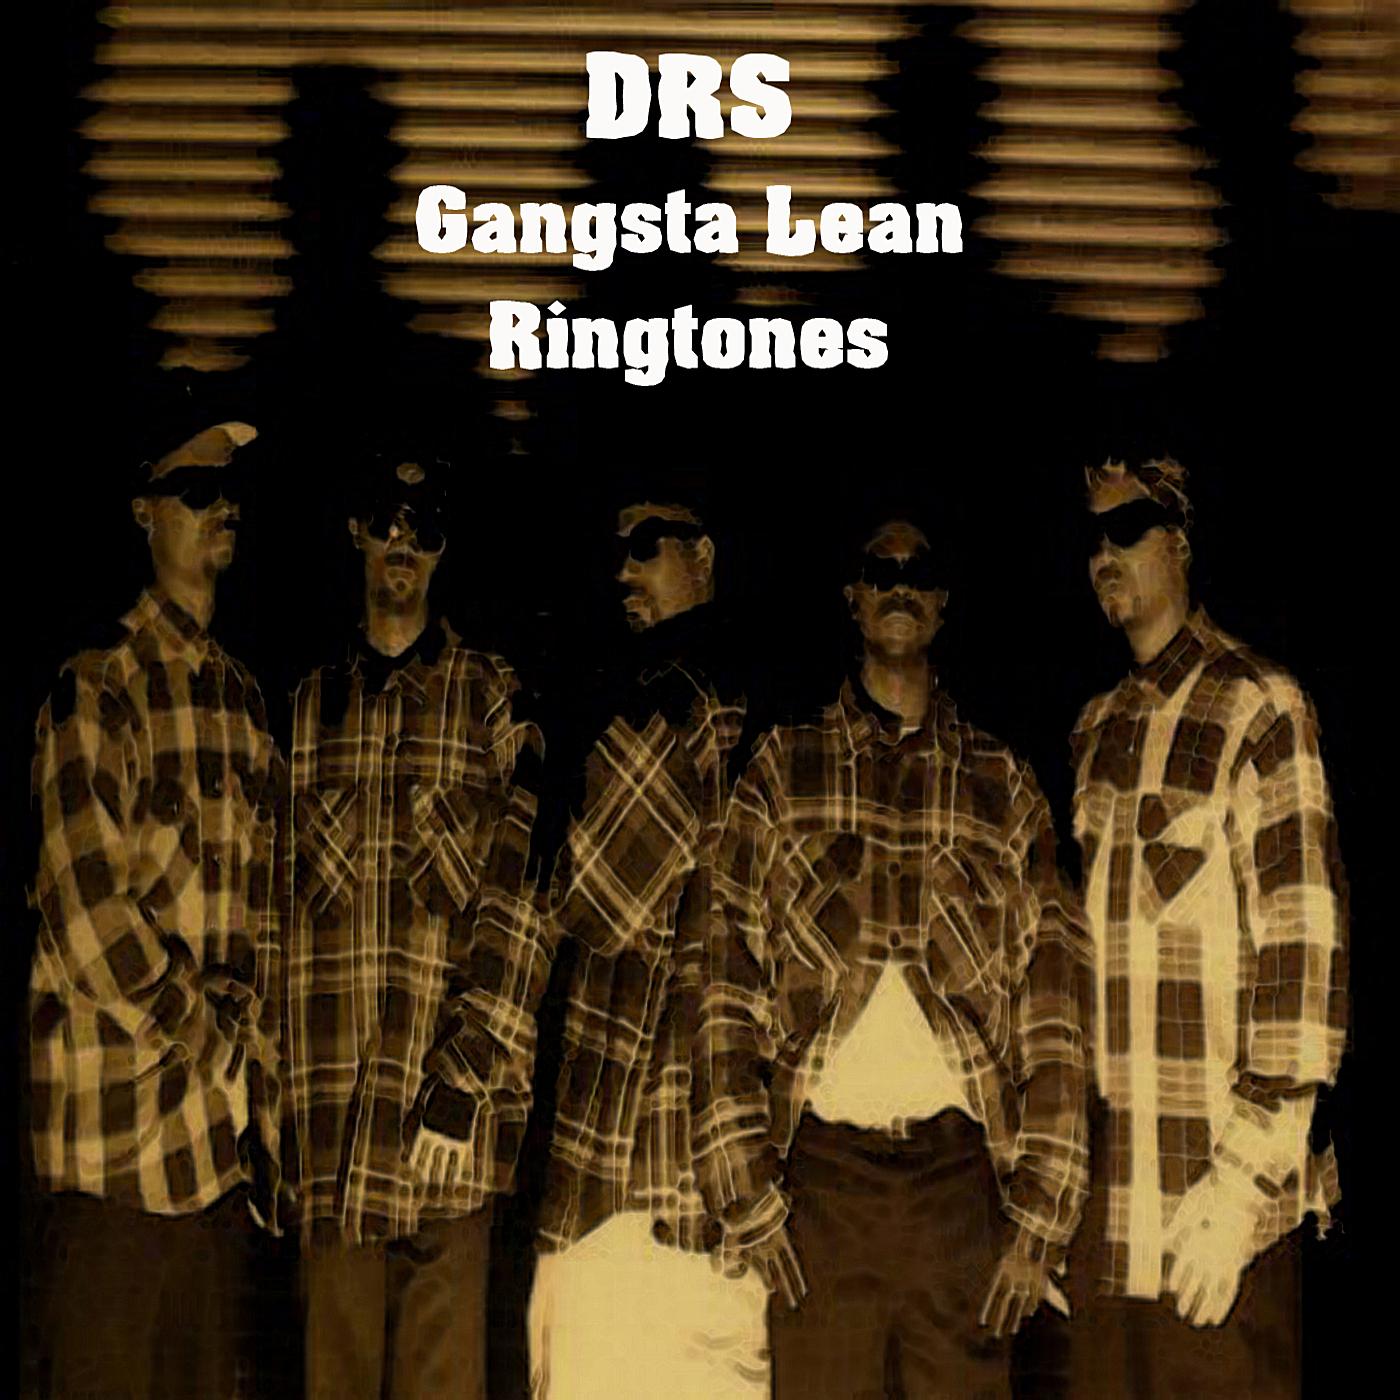 Drs gangsta lean mp3 download livinsurf.